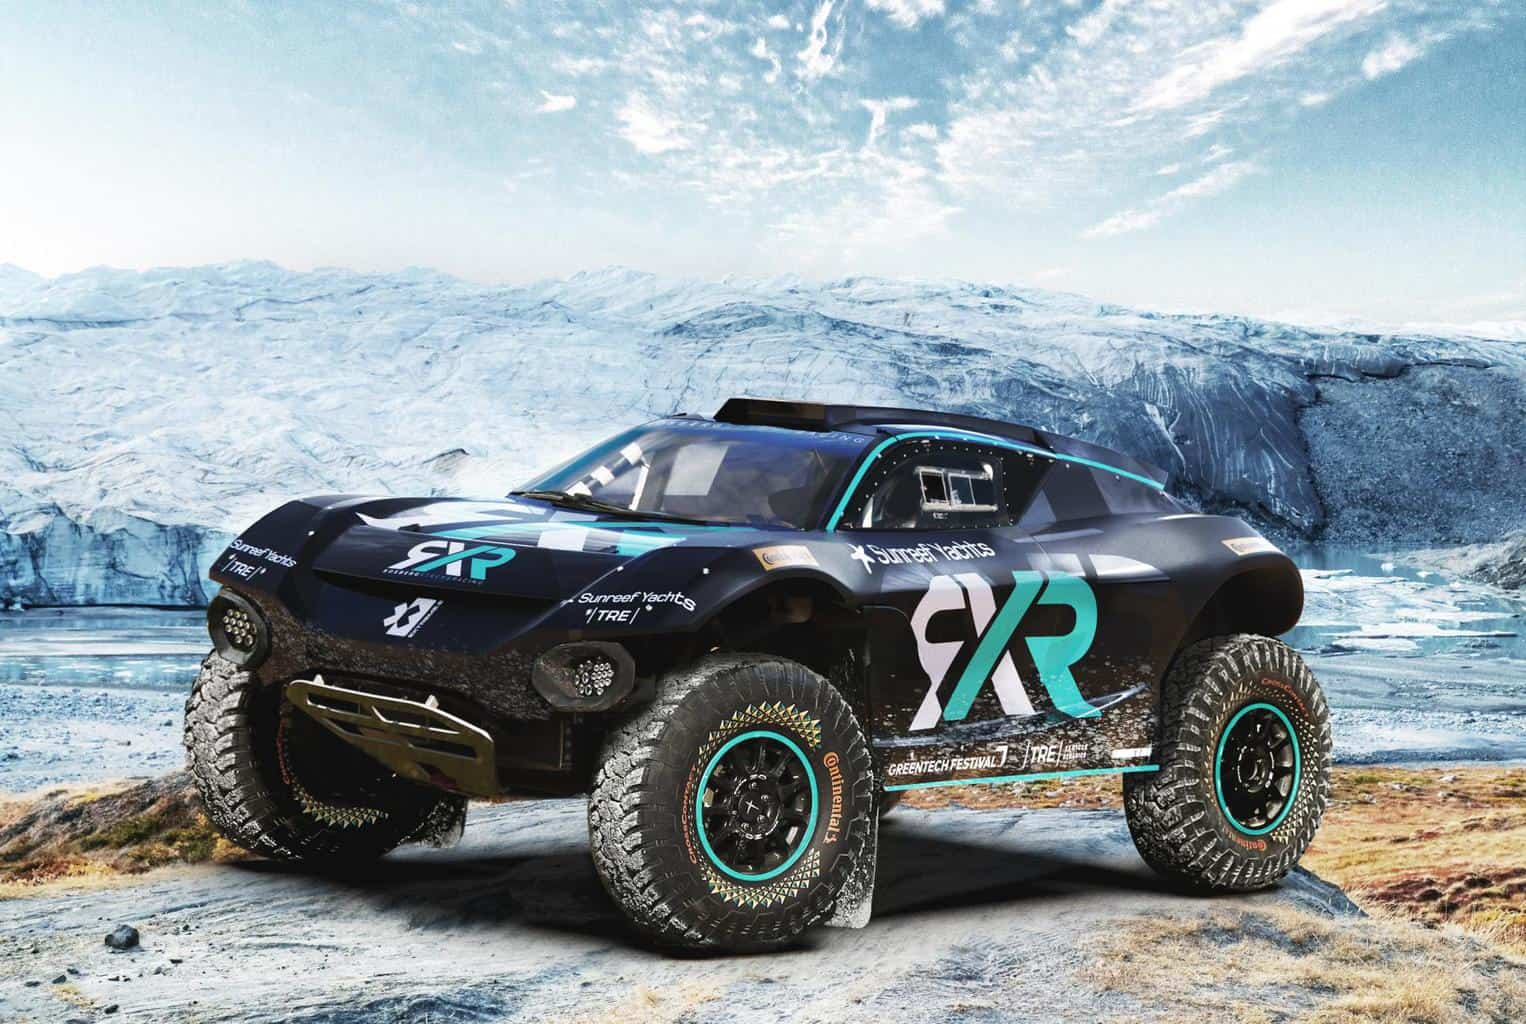 Nach Hamilton zieht es auch Nico Rosberg zur E-Rallye-Serie Extreme E